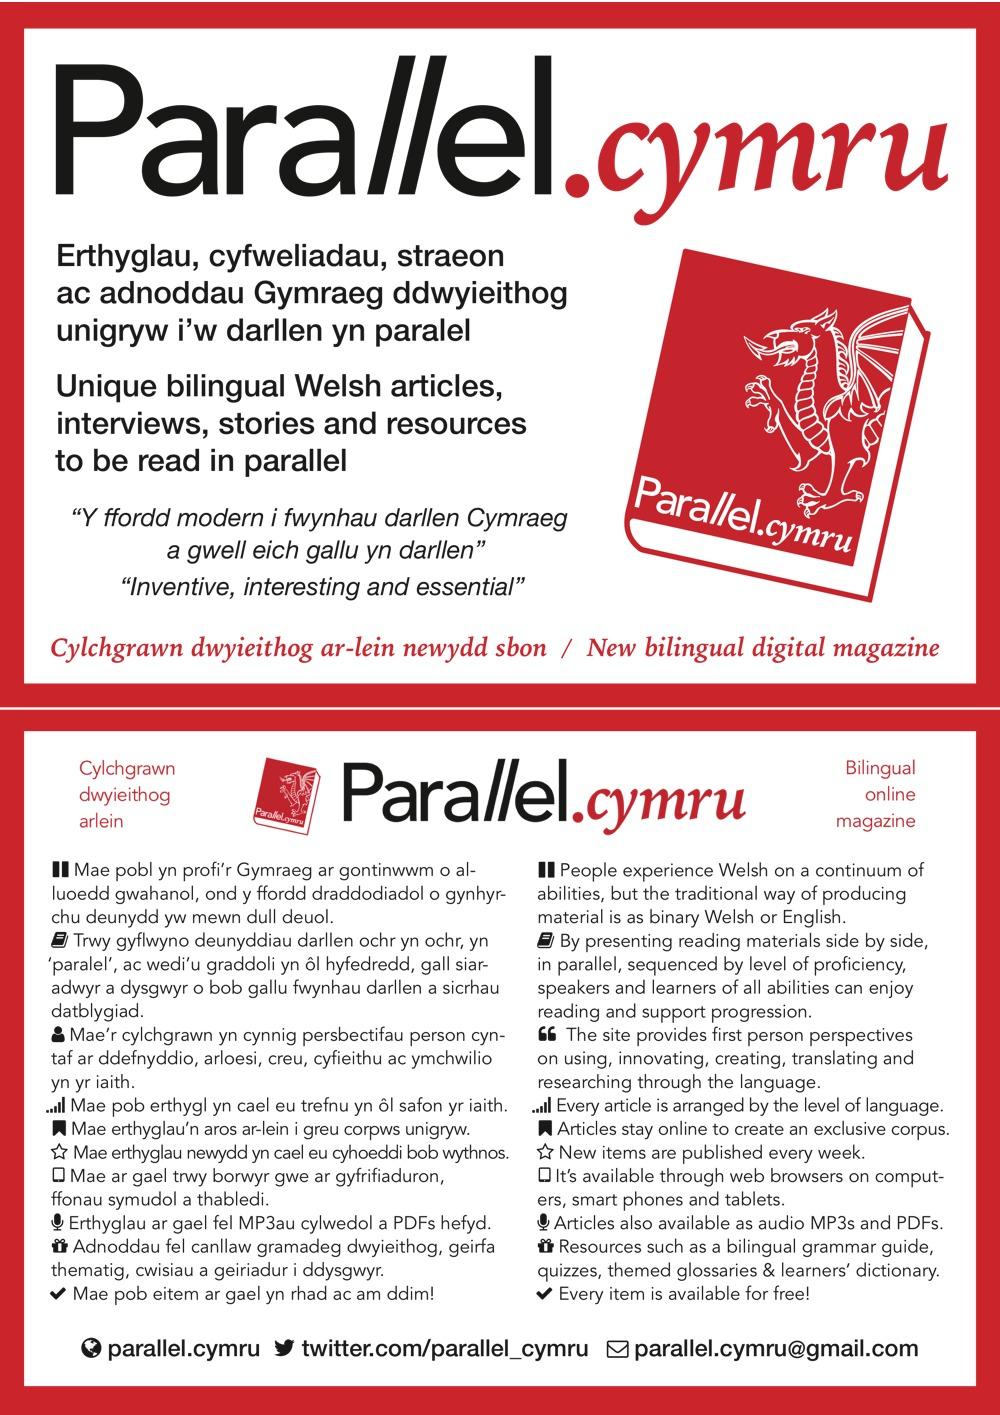 A5 pamffled parallel.cymru